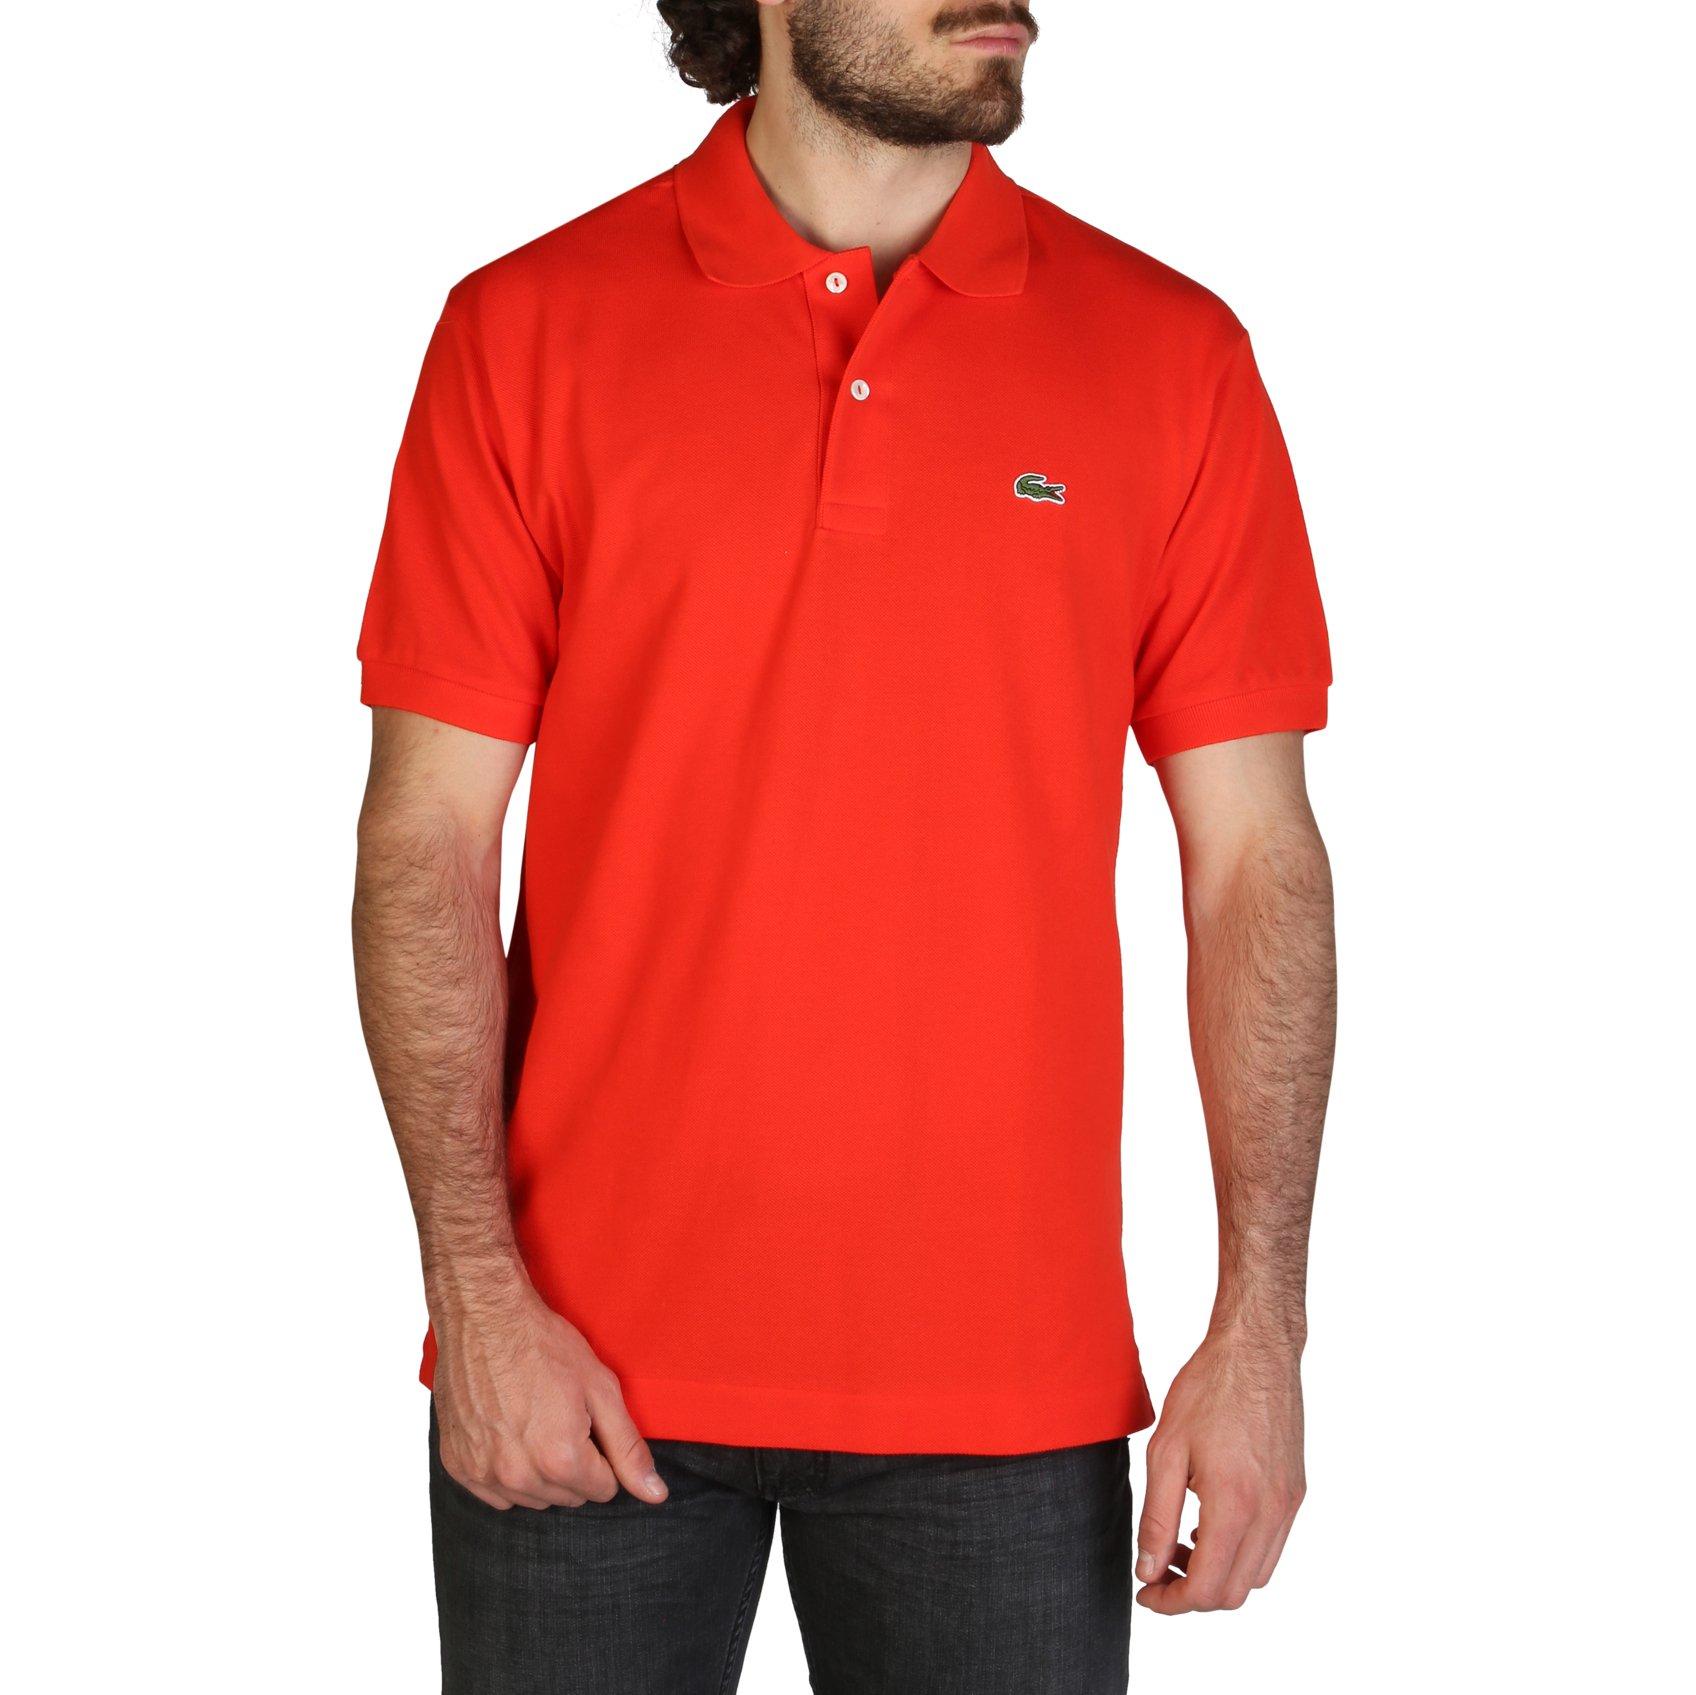 Lacoste Men's Polo Shirt Various Colours L1212_REGULAR - red S